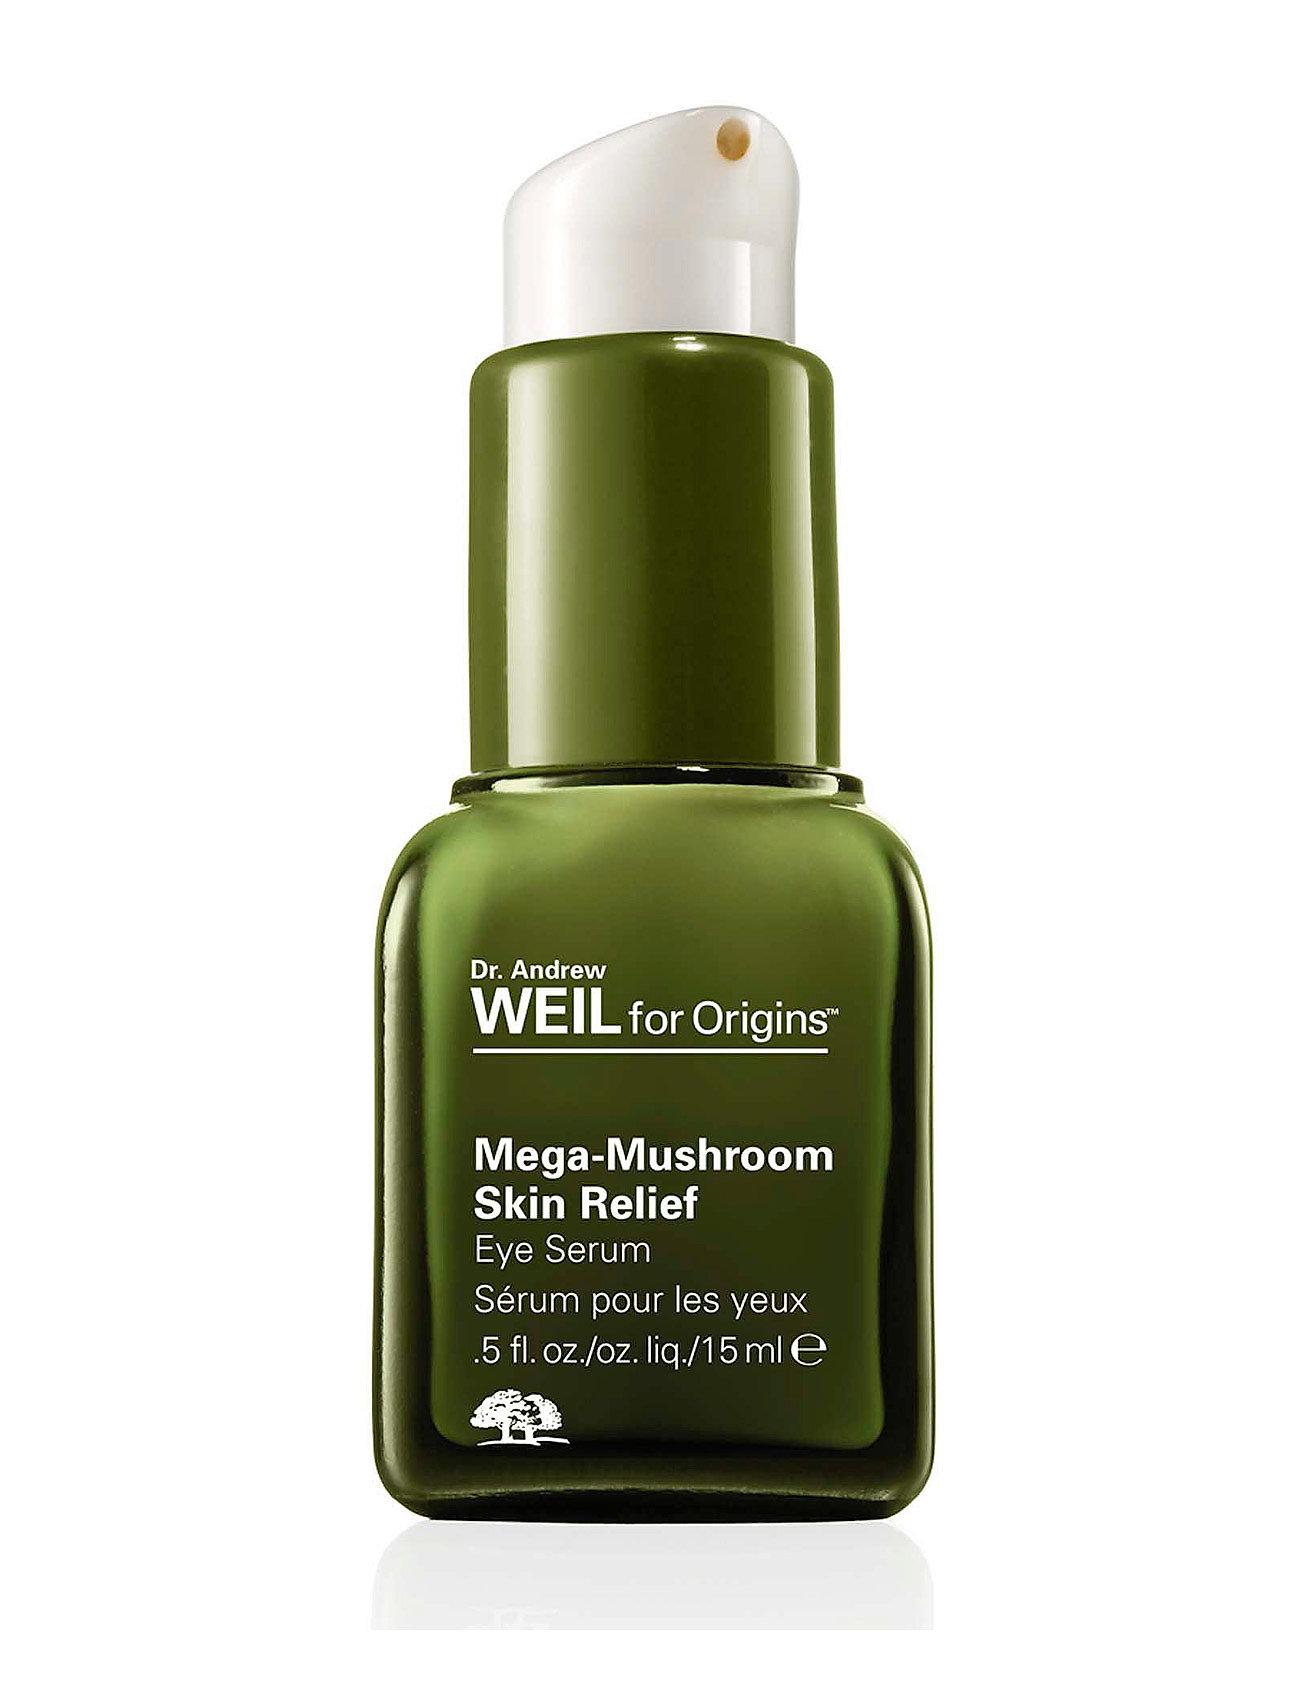 Dr. weil mega-mushroom skin relief eye serum fra origins på boozt.com dk